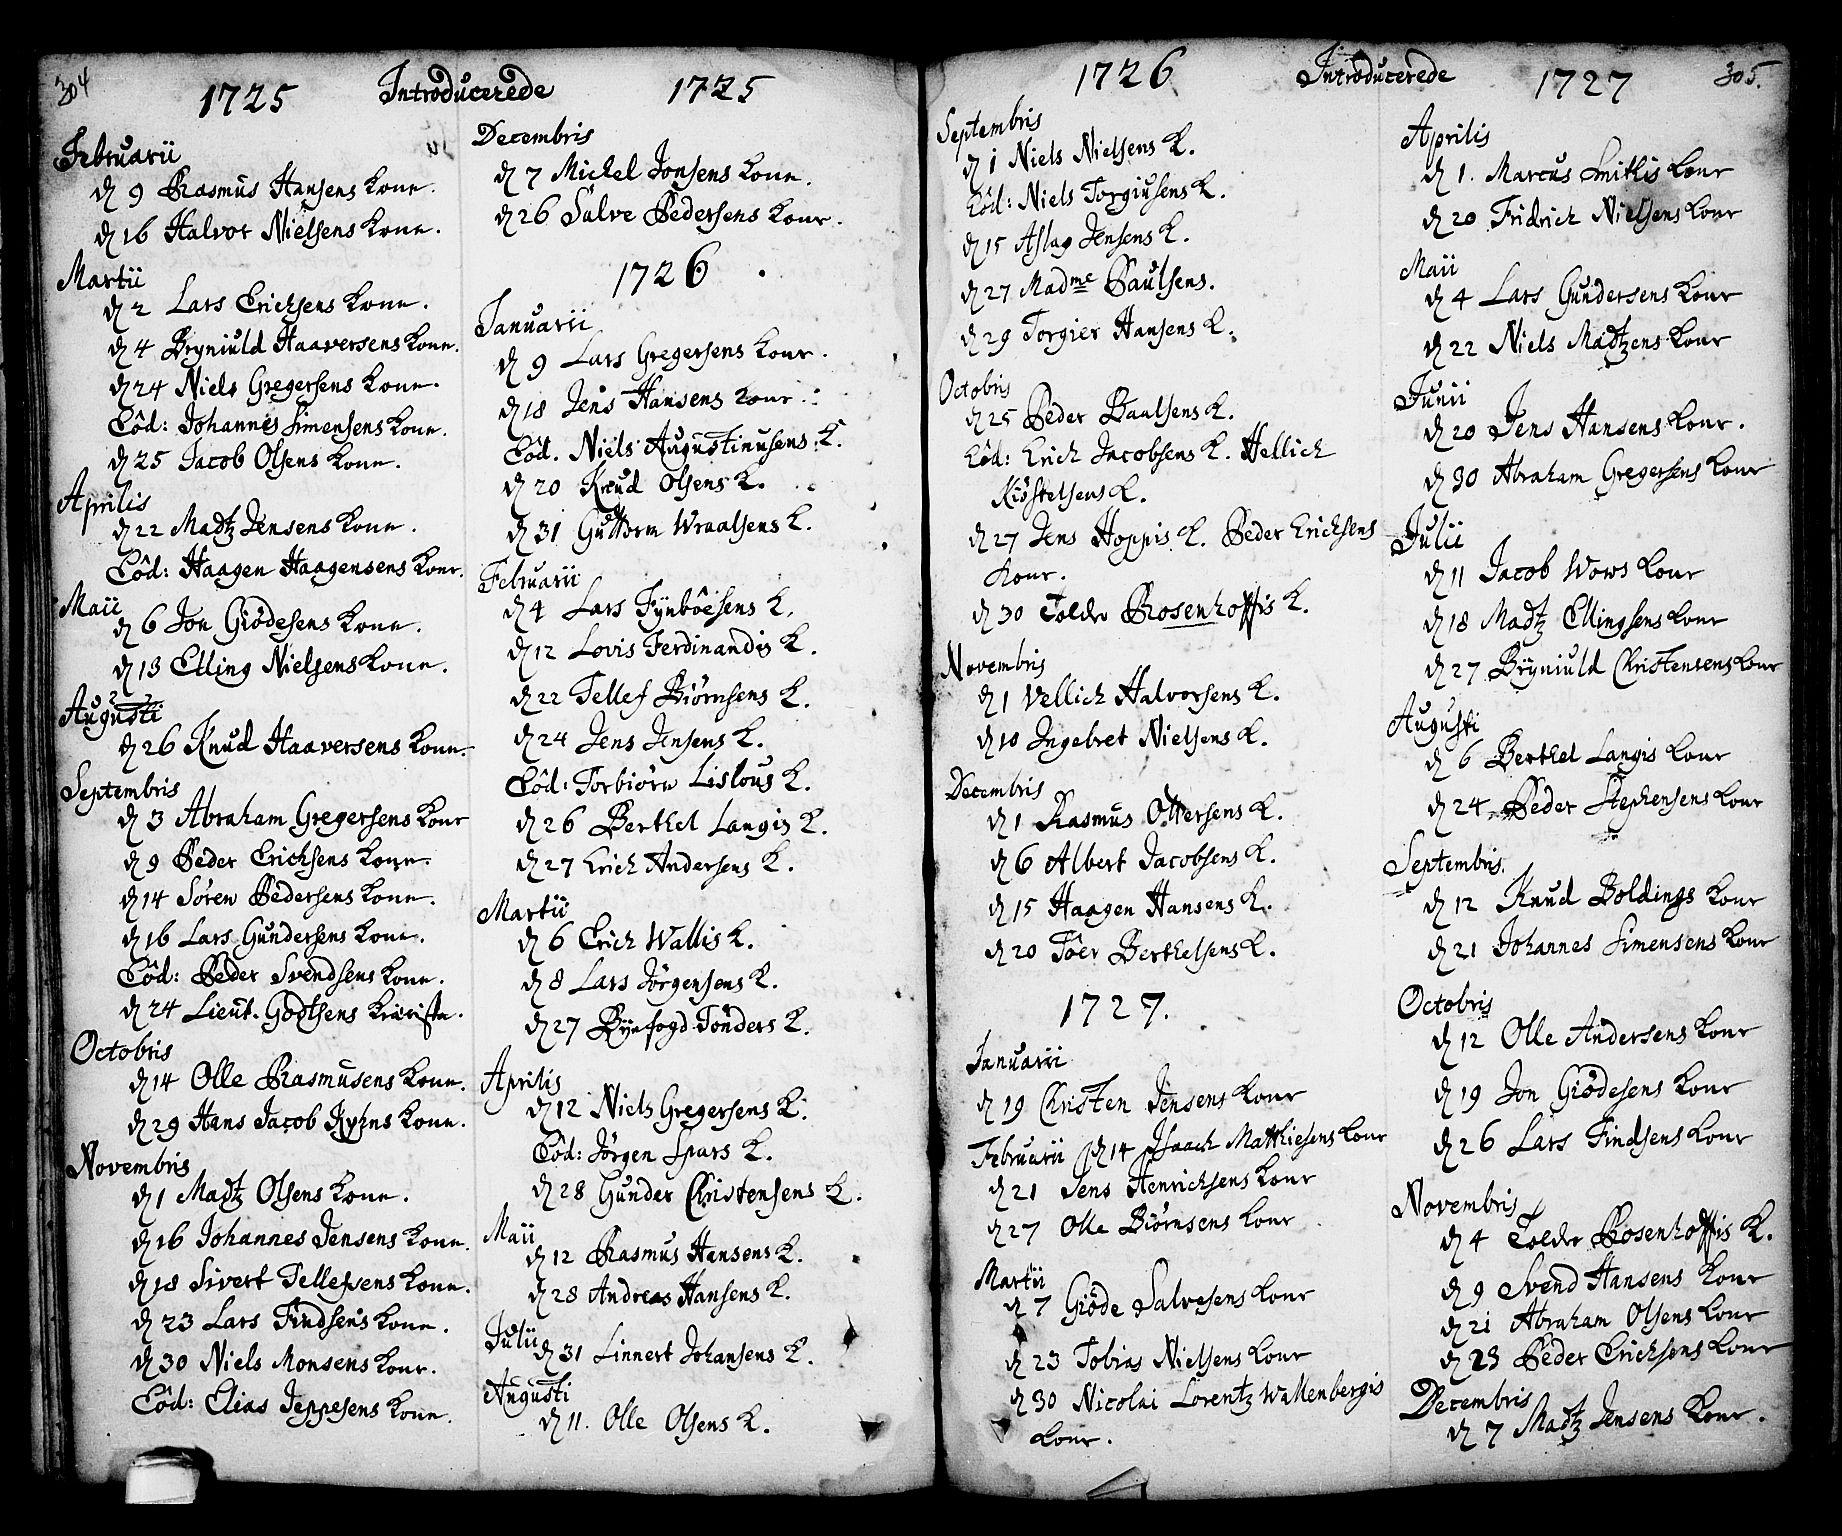 SAKO, Kragerø kirkebøker, F/Fa/L0001: Ministerialbok nr. 1, 1702-1766, s. 304-305